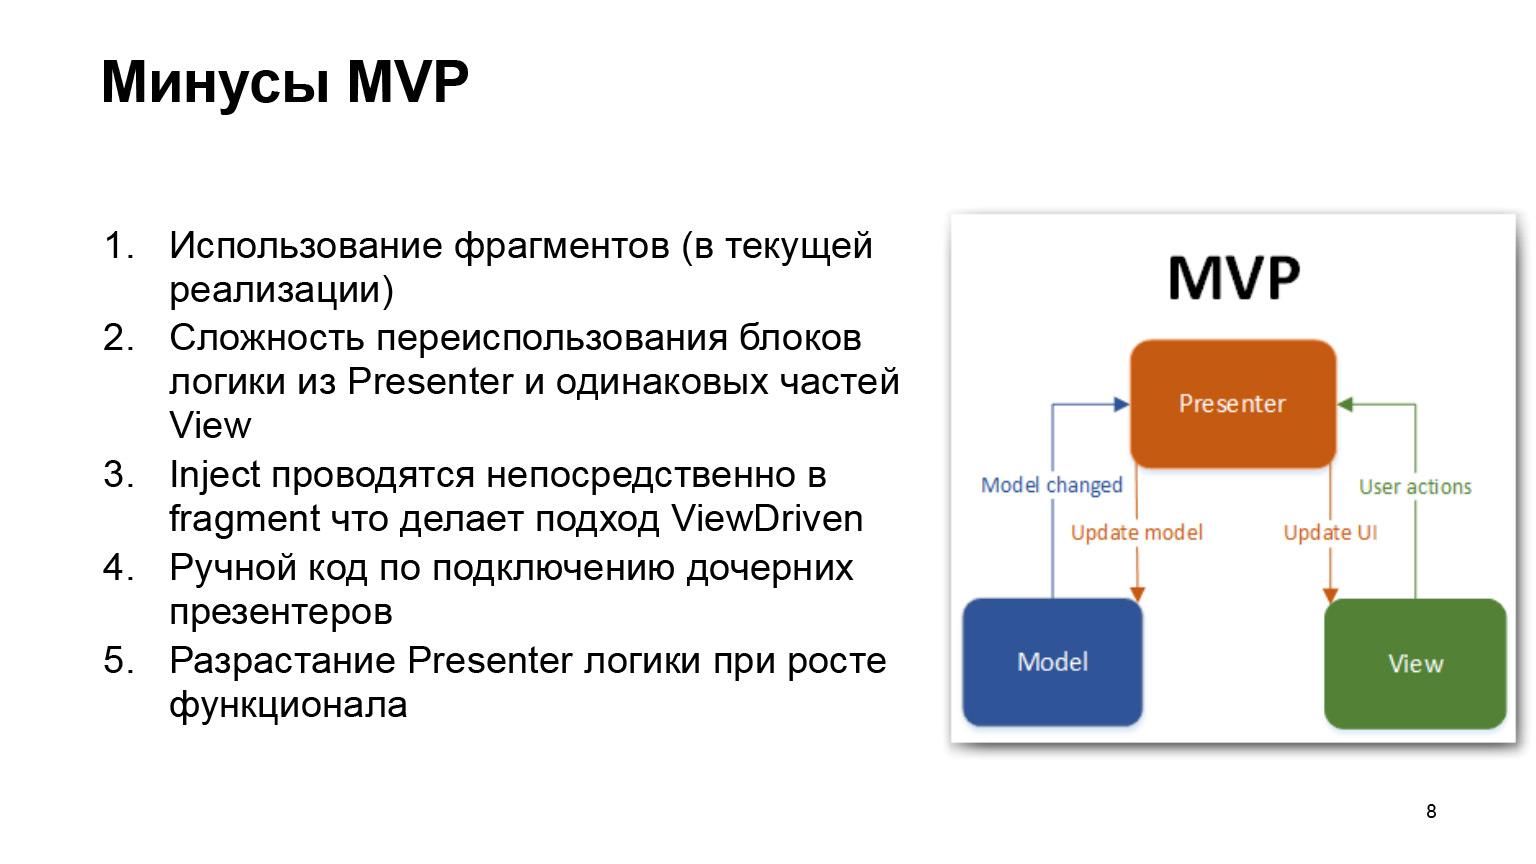 Как мы внедряли архитектуру RIBs. Доклад Яндекс.Такси - 4